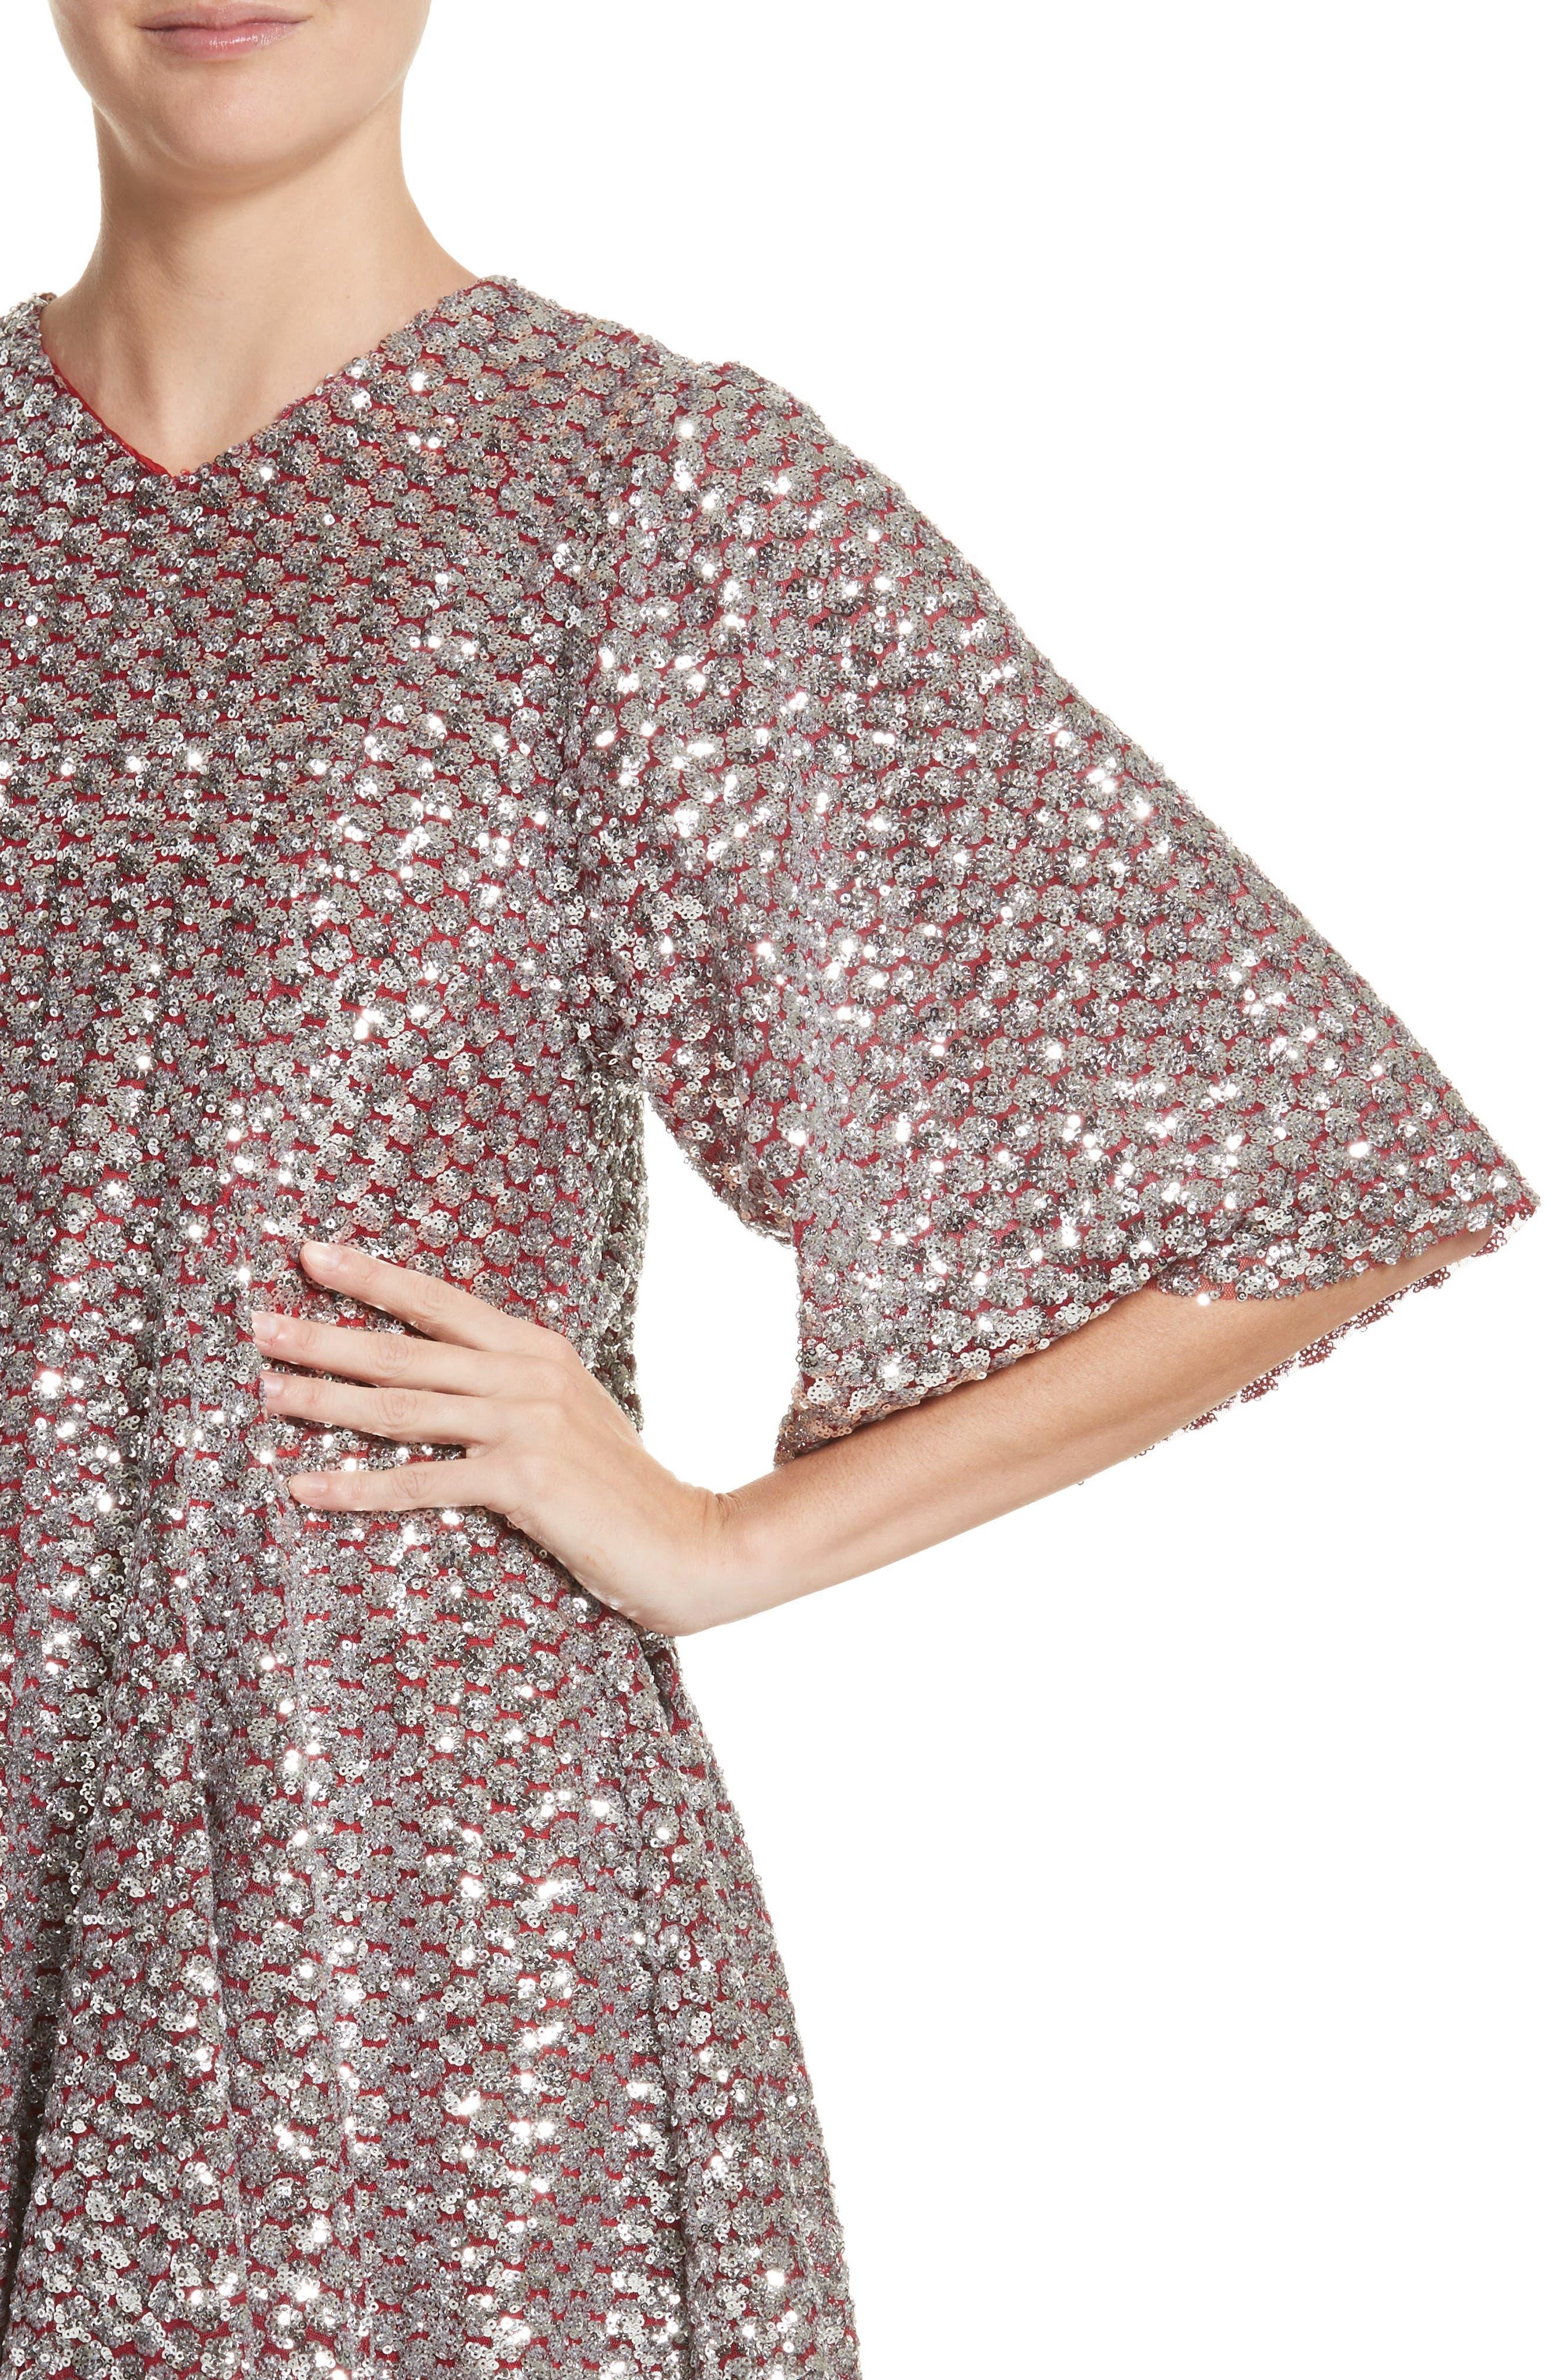 Simmi Sequin Dress,                             Alternate thumbnail 4, color,                             040